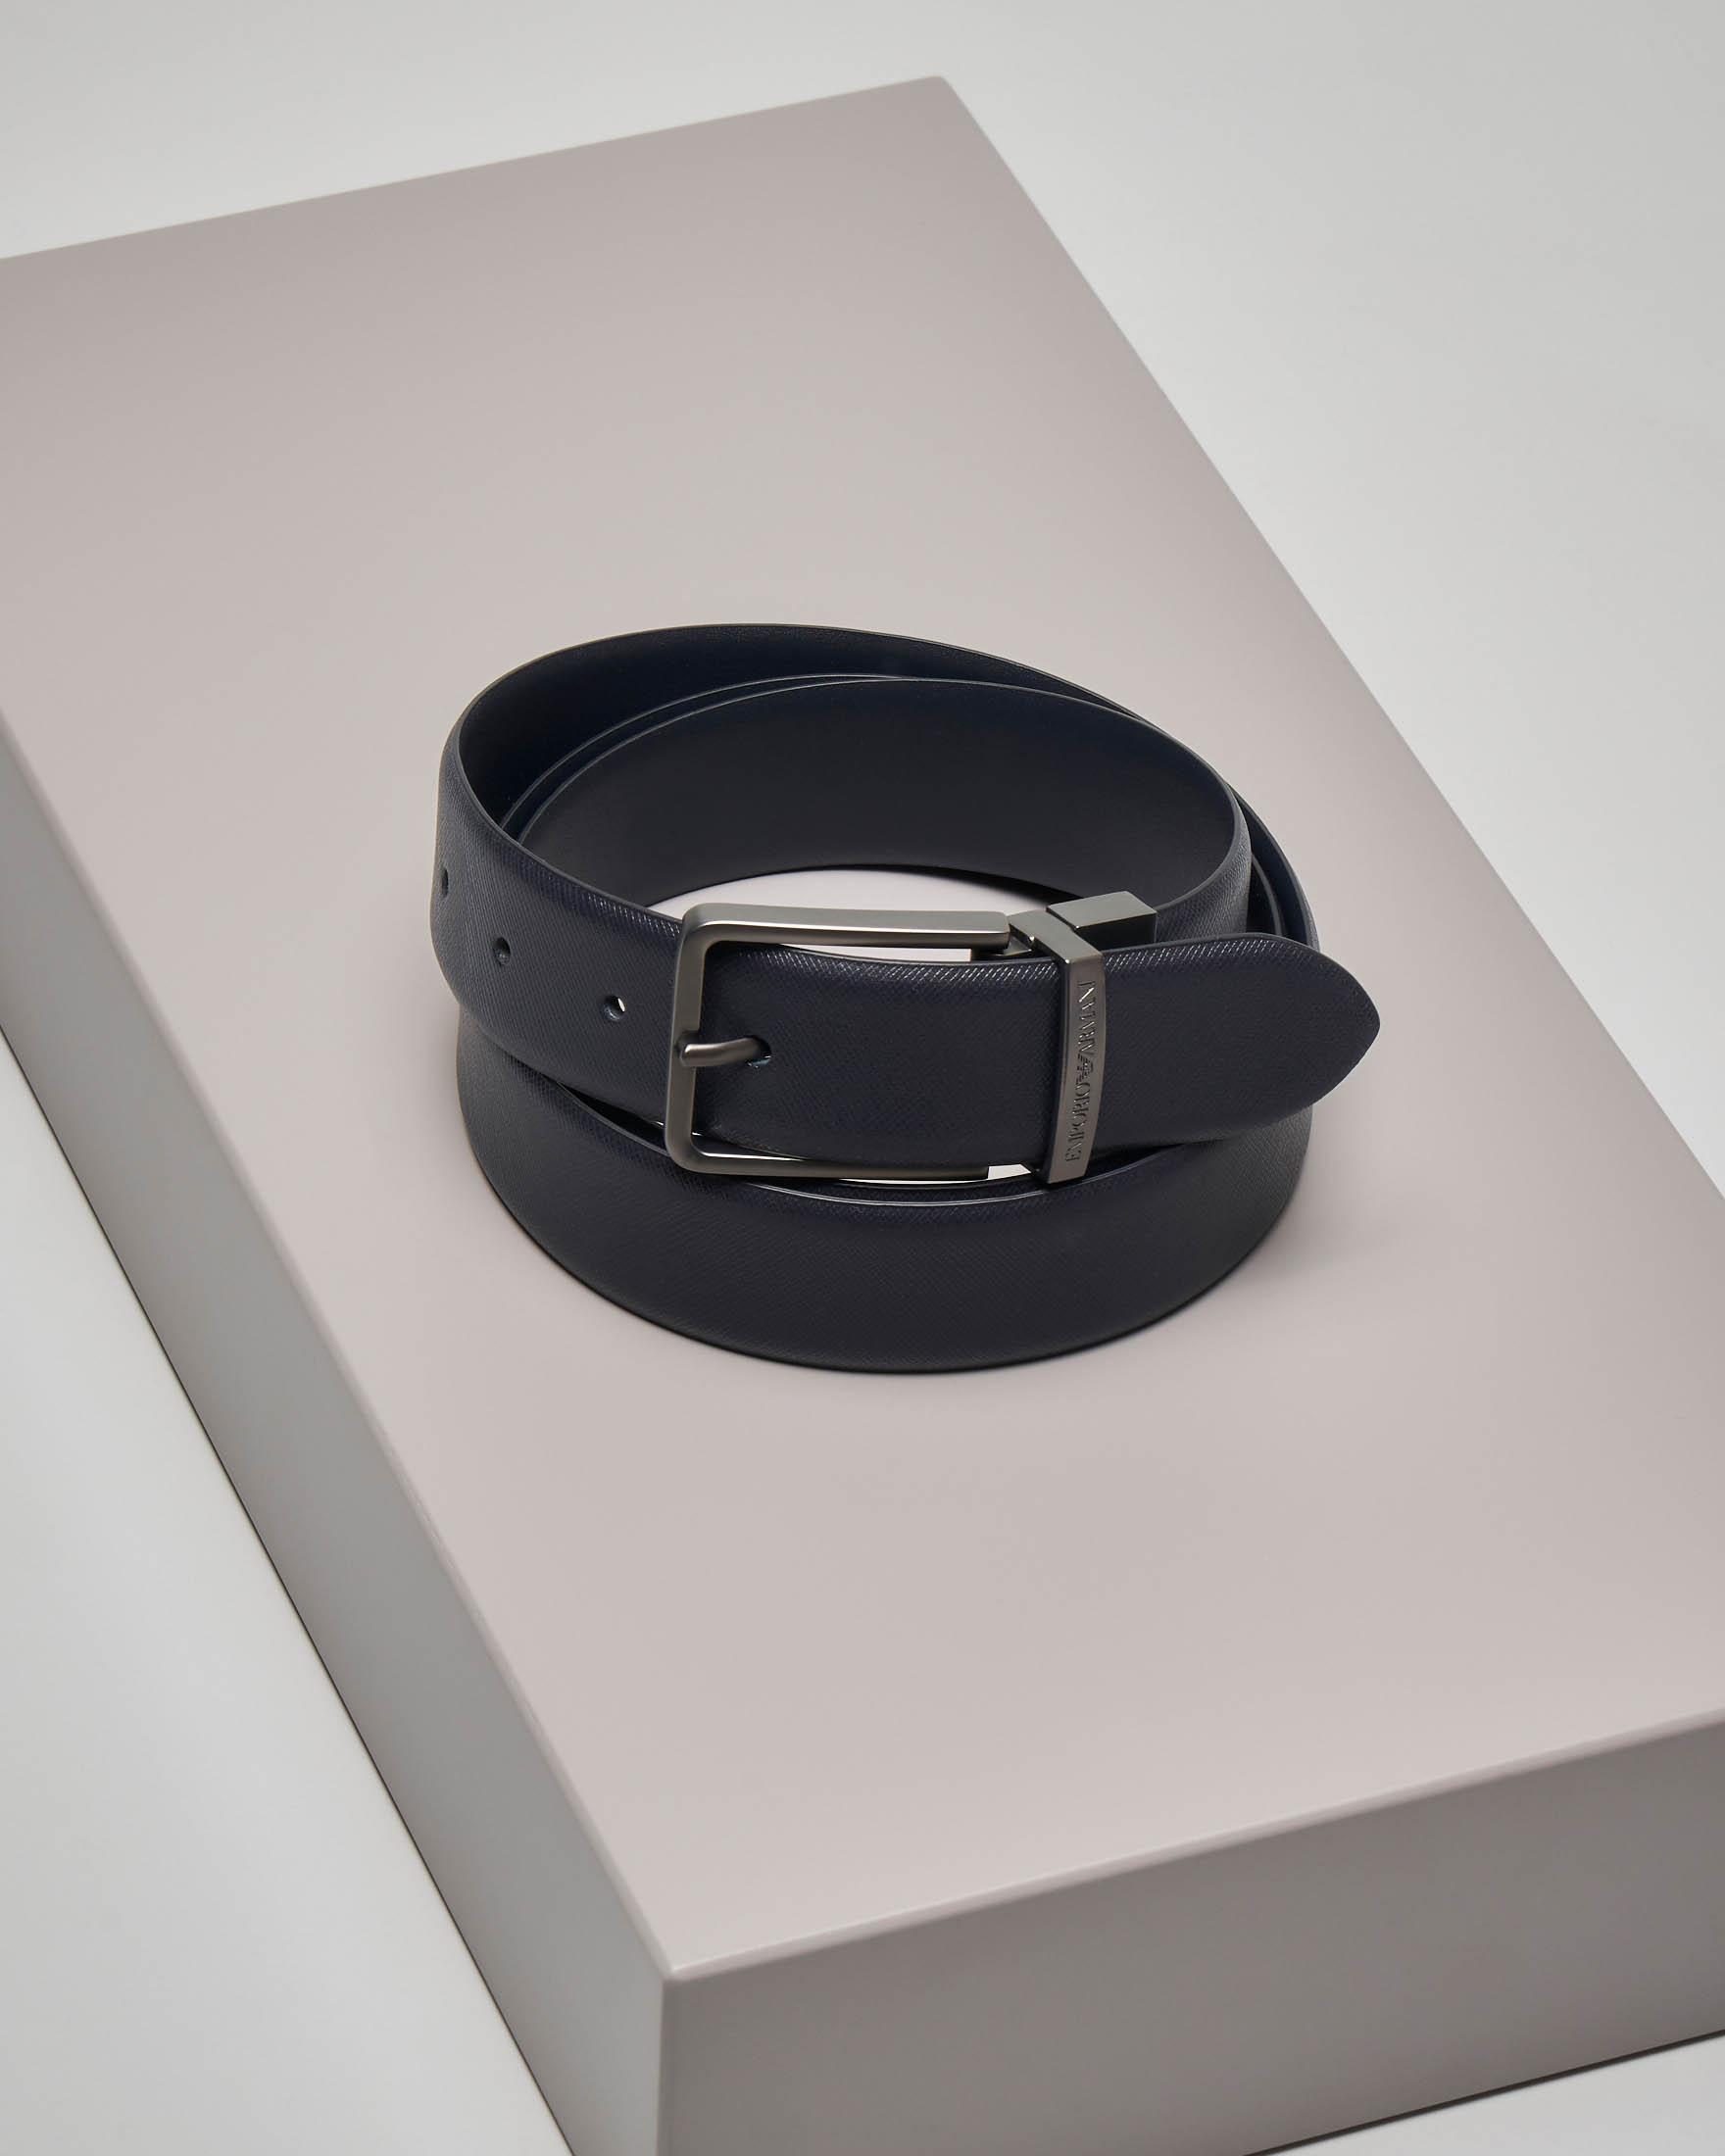 Cintura blu in pelle saffiano reversibile in pelle liscia